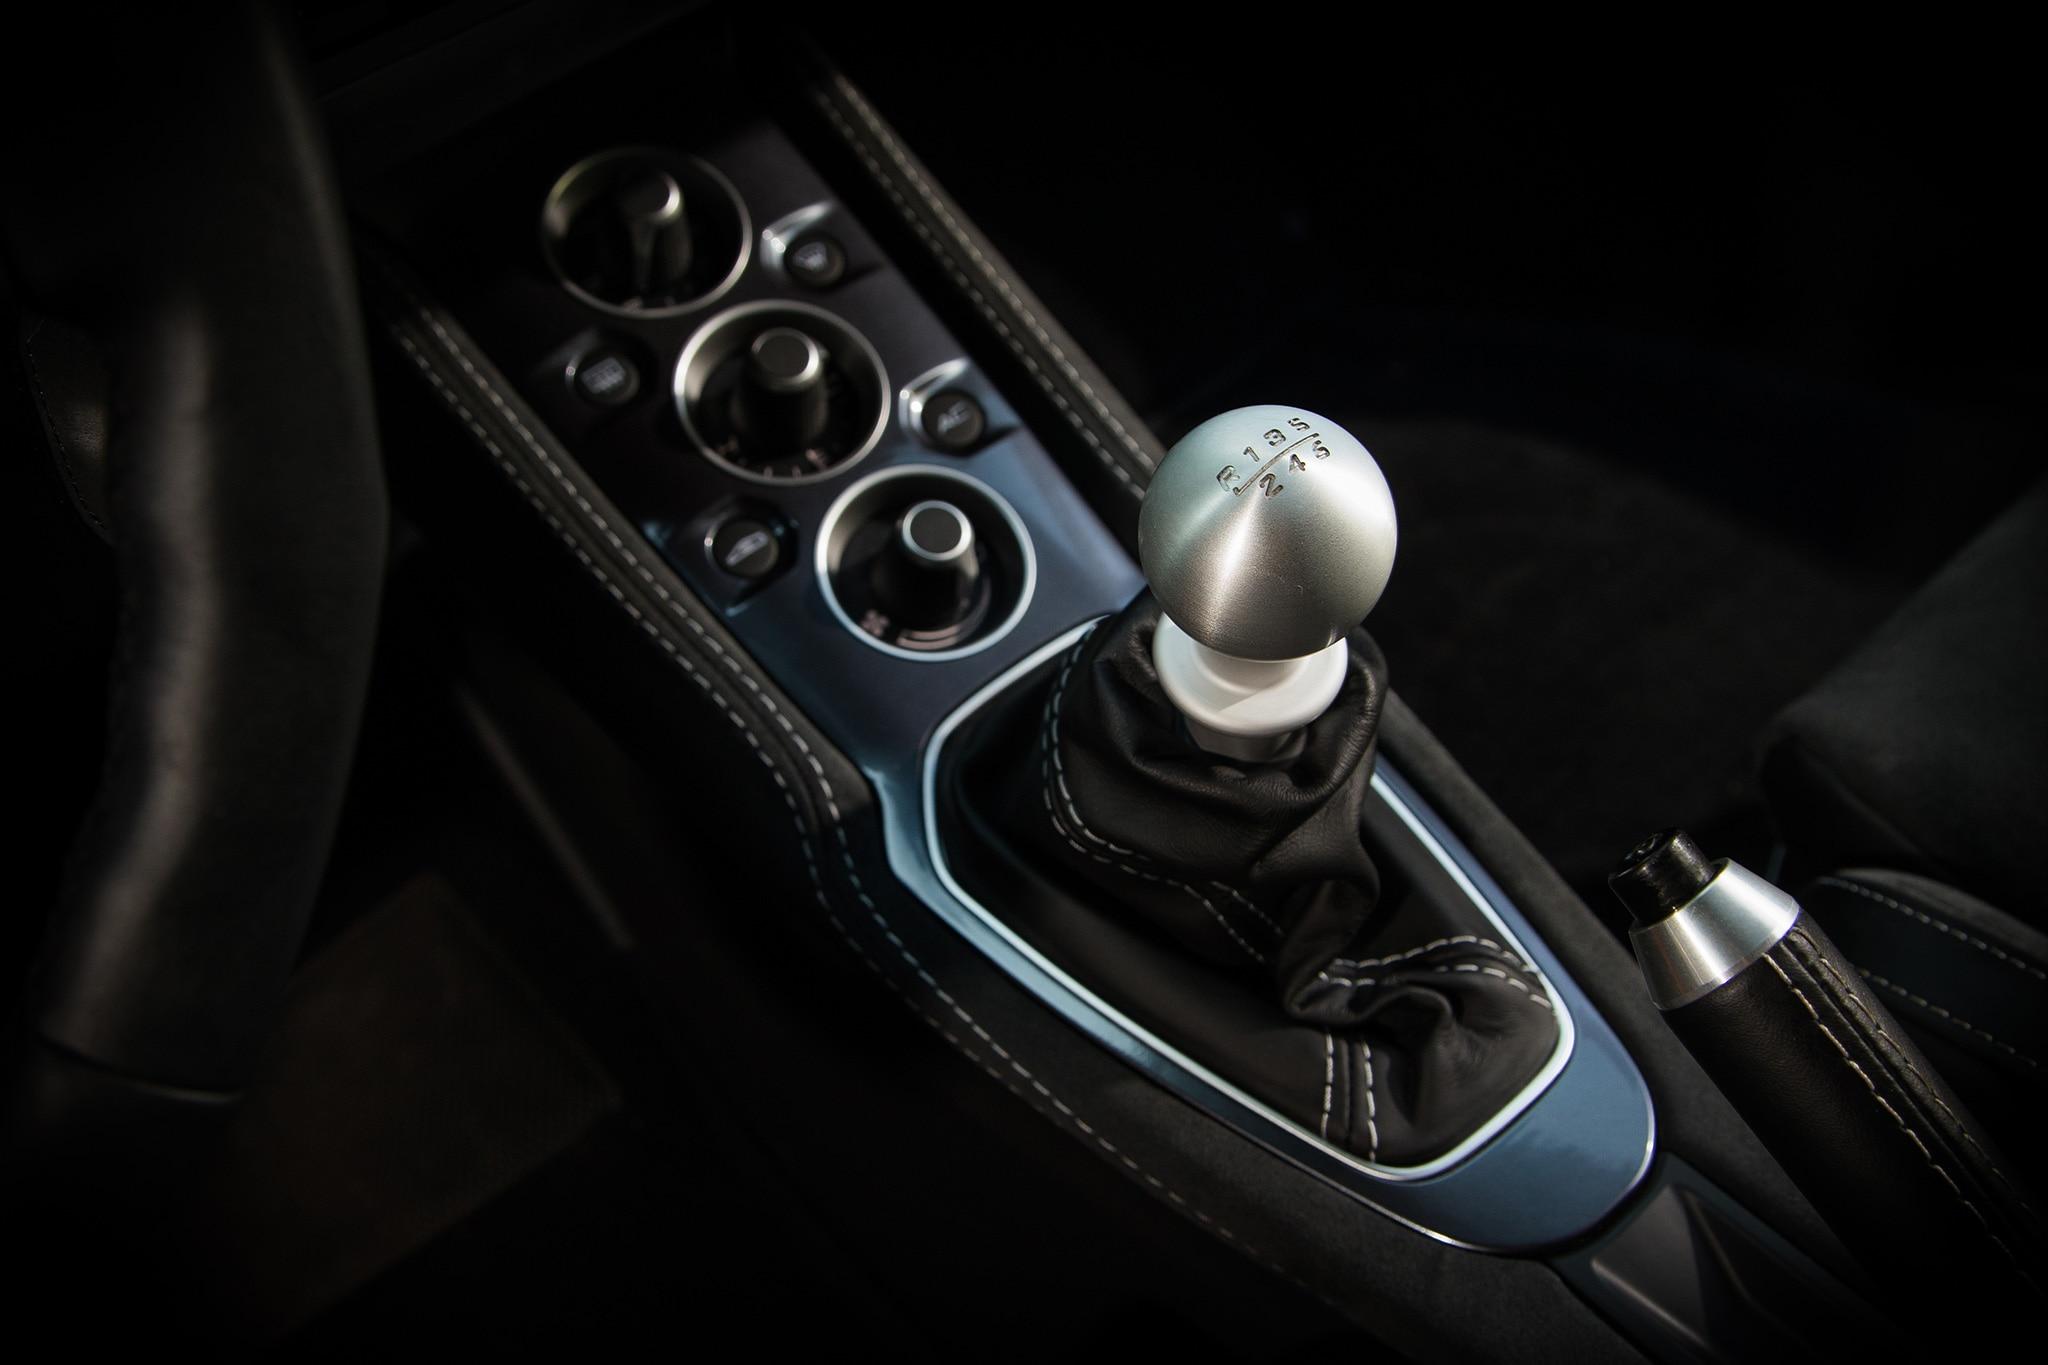 2017 Lotus Evora 400 Gear Shifter 01